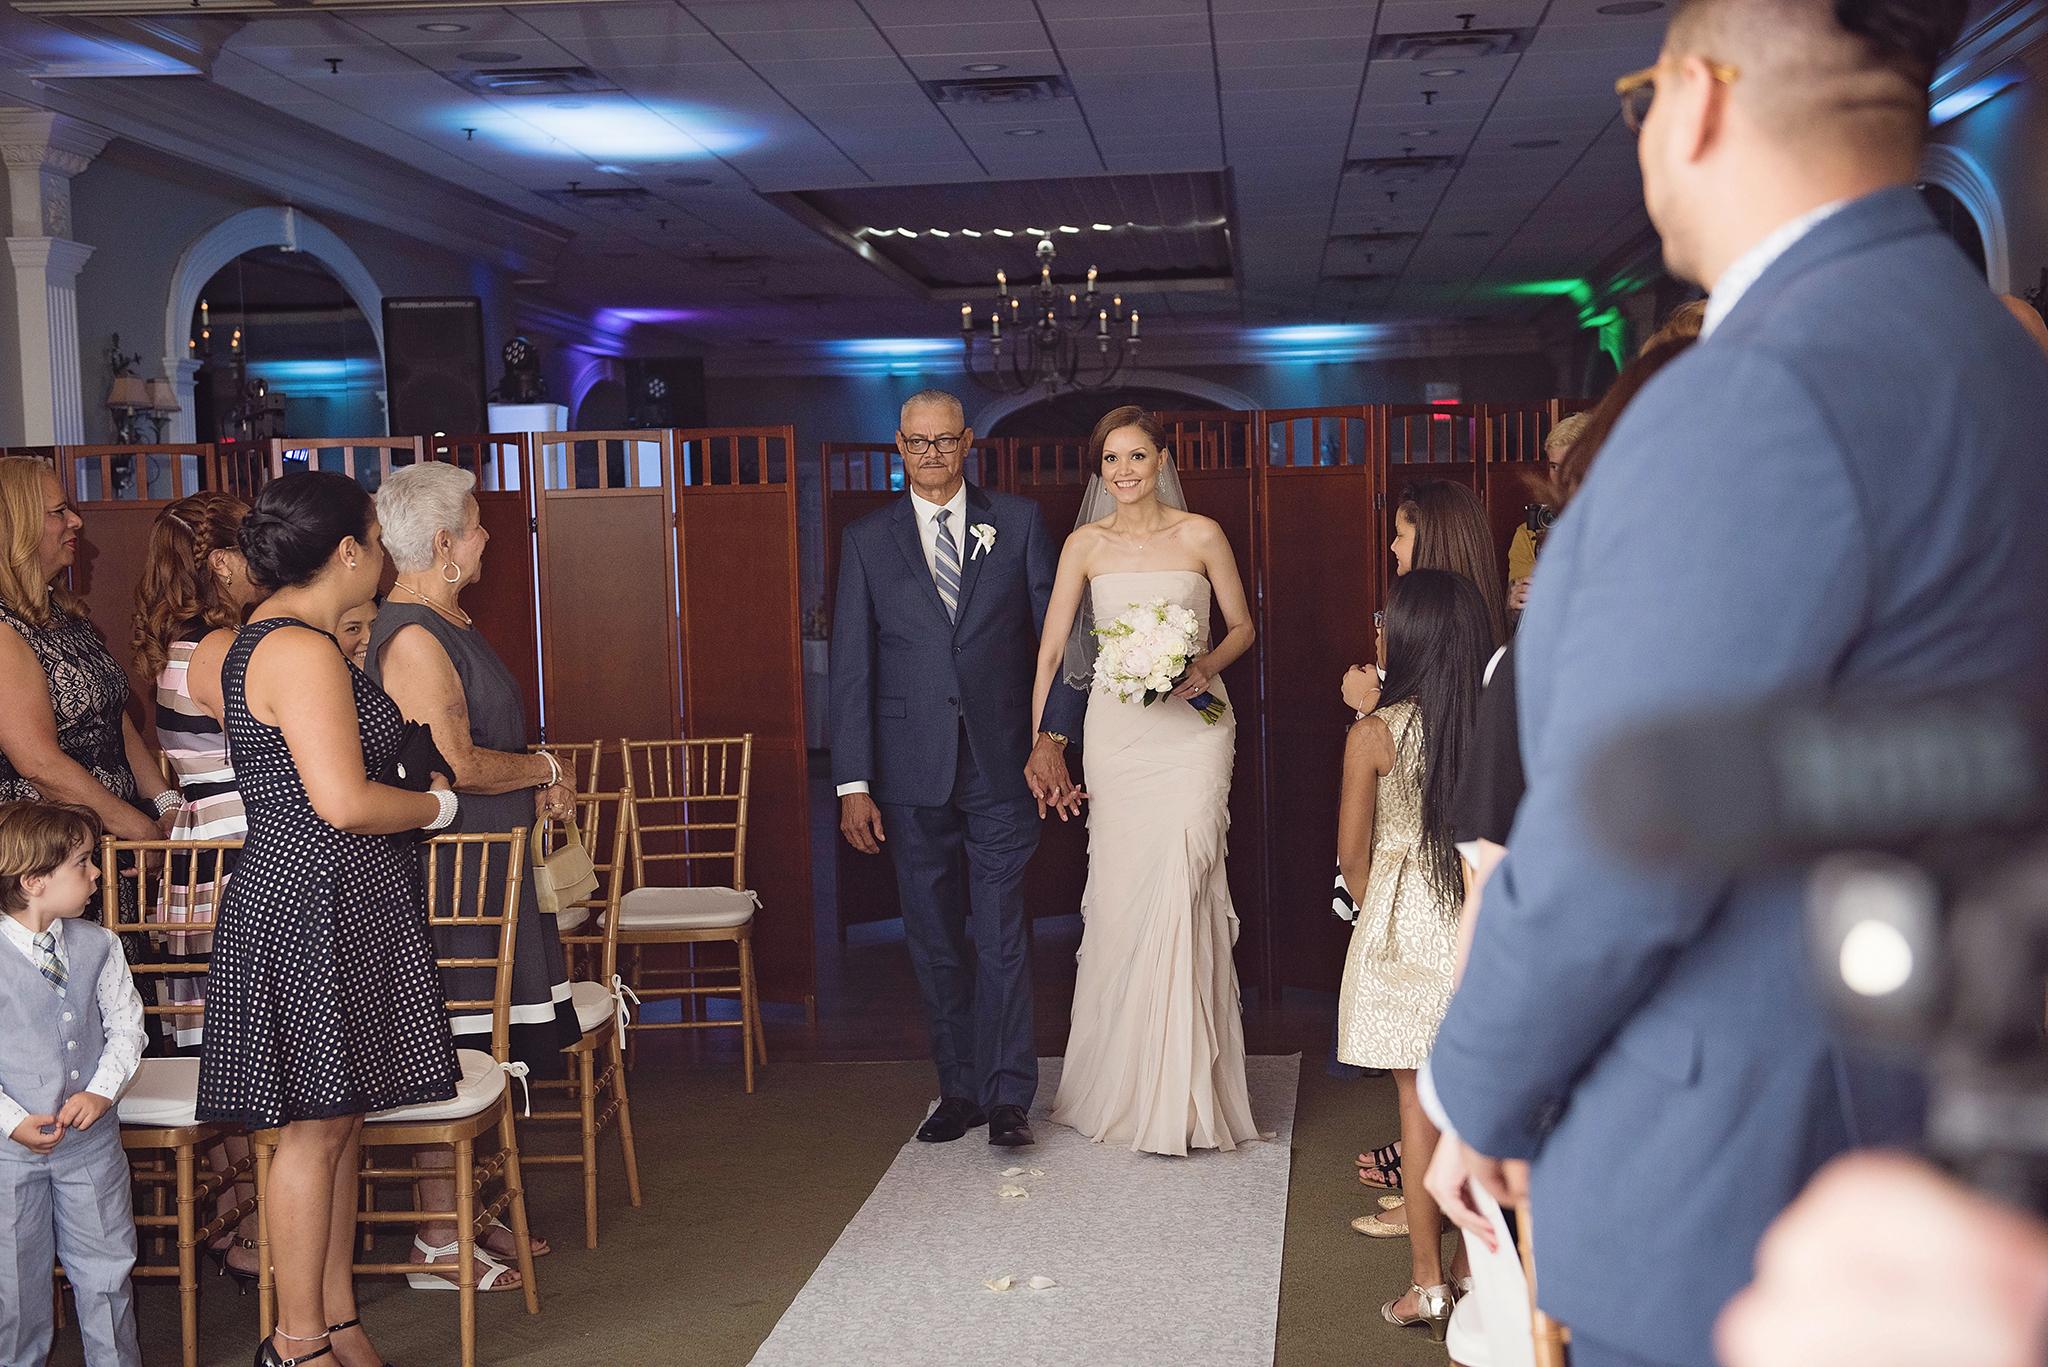 NJ-NY-wedding-photographer-041NJ-NY-wedding-photographer-041NJ-NY-WEDDING-PHOTOGRAPHER-041.JPG